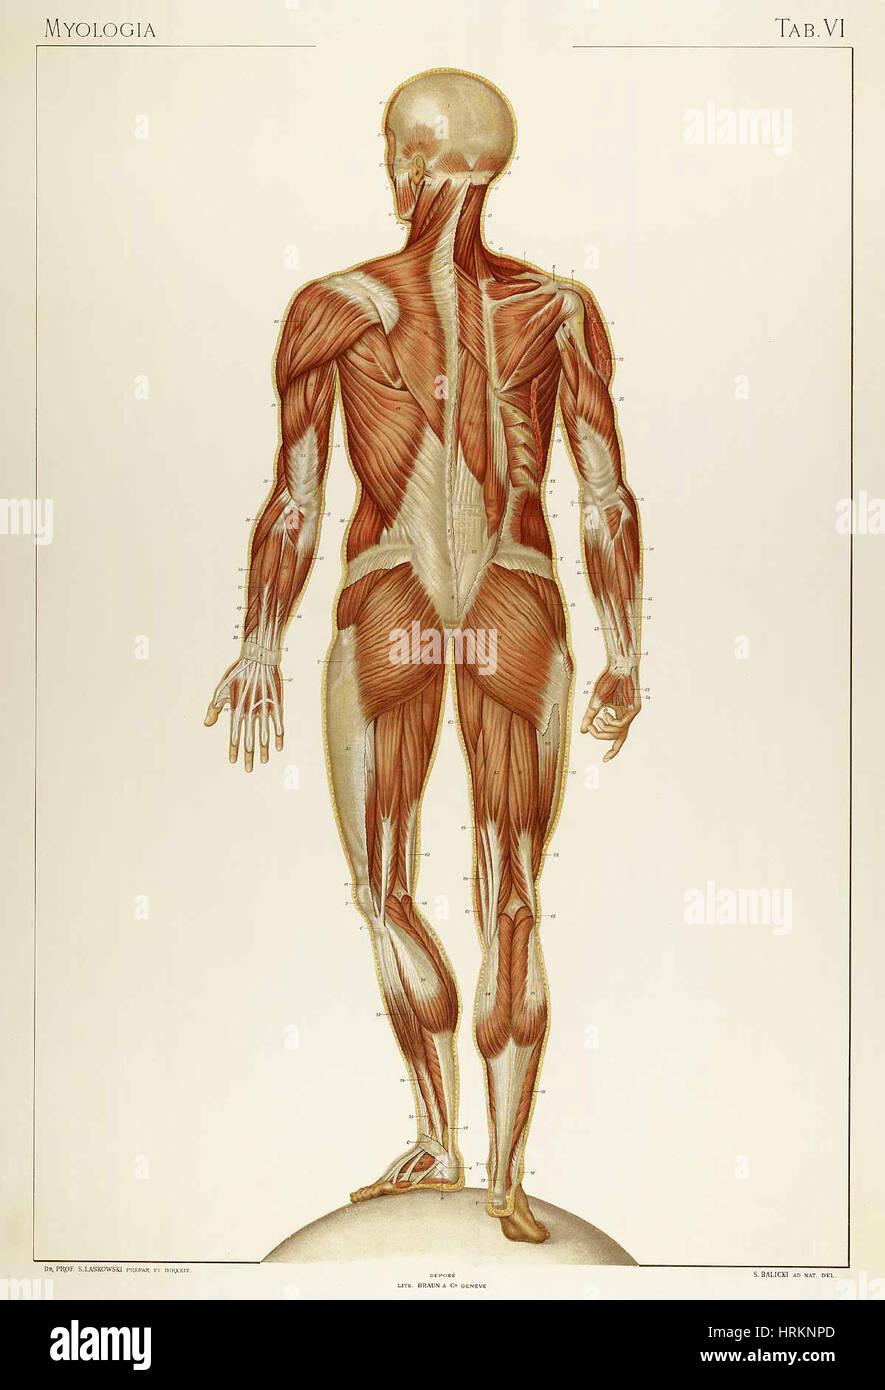 Illustration anatomique historique Photo Stock